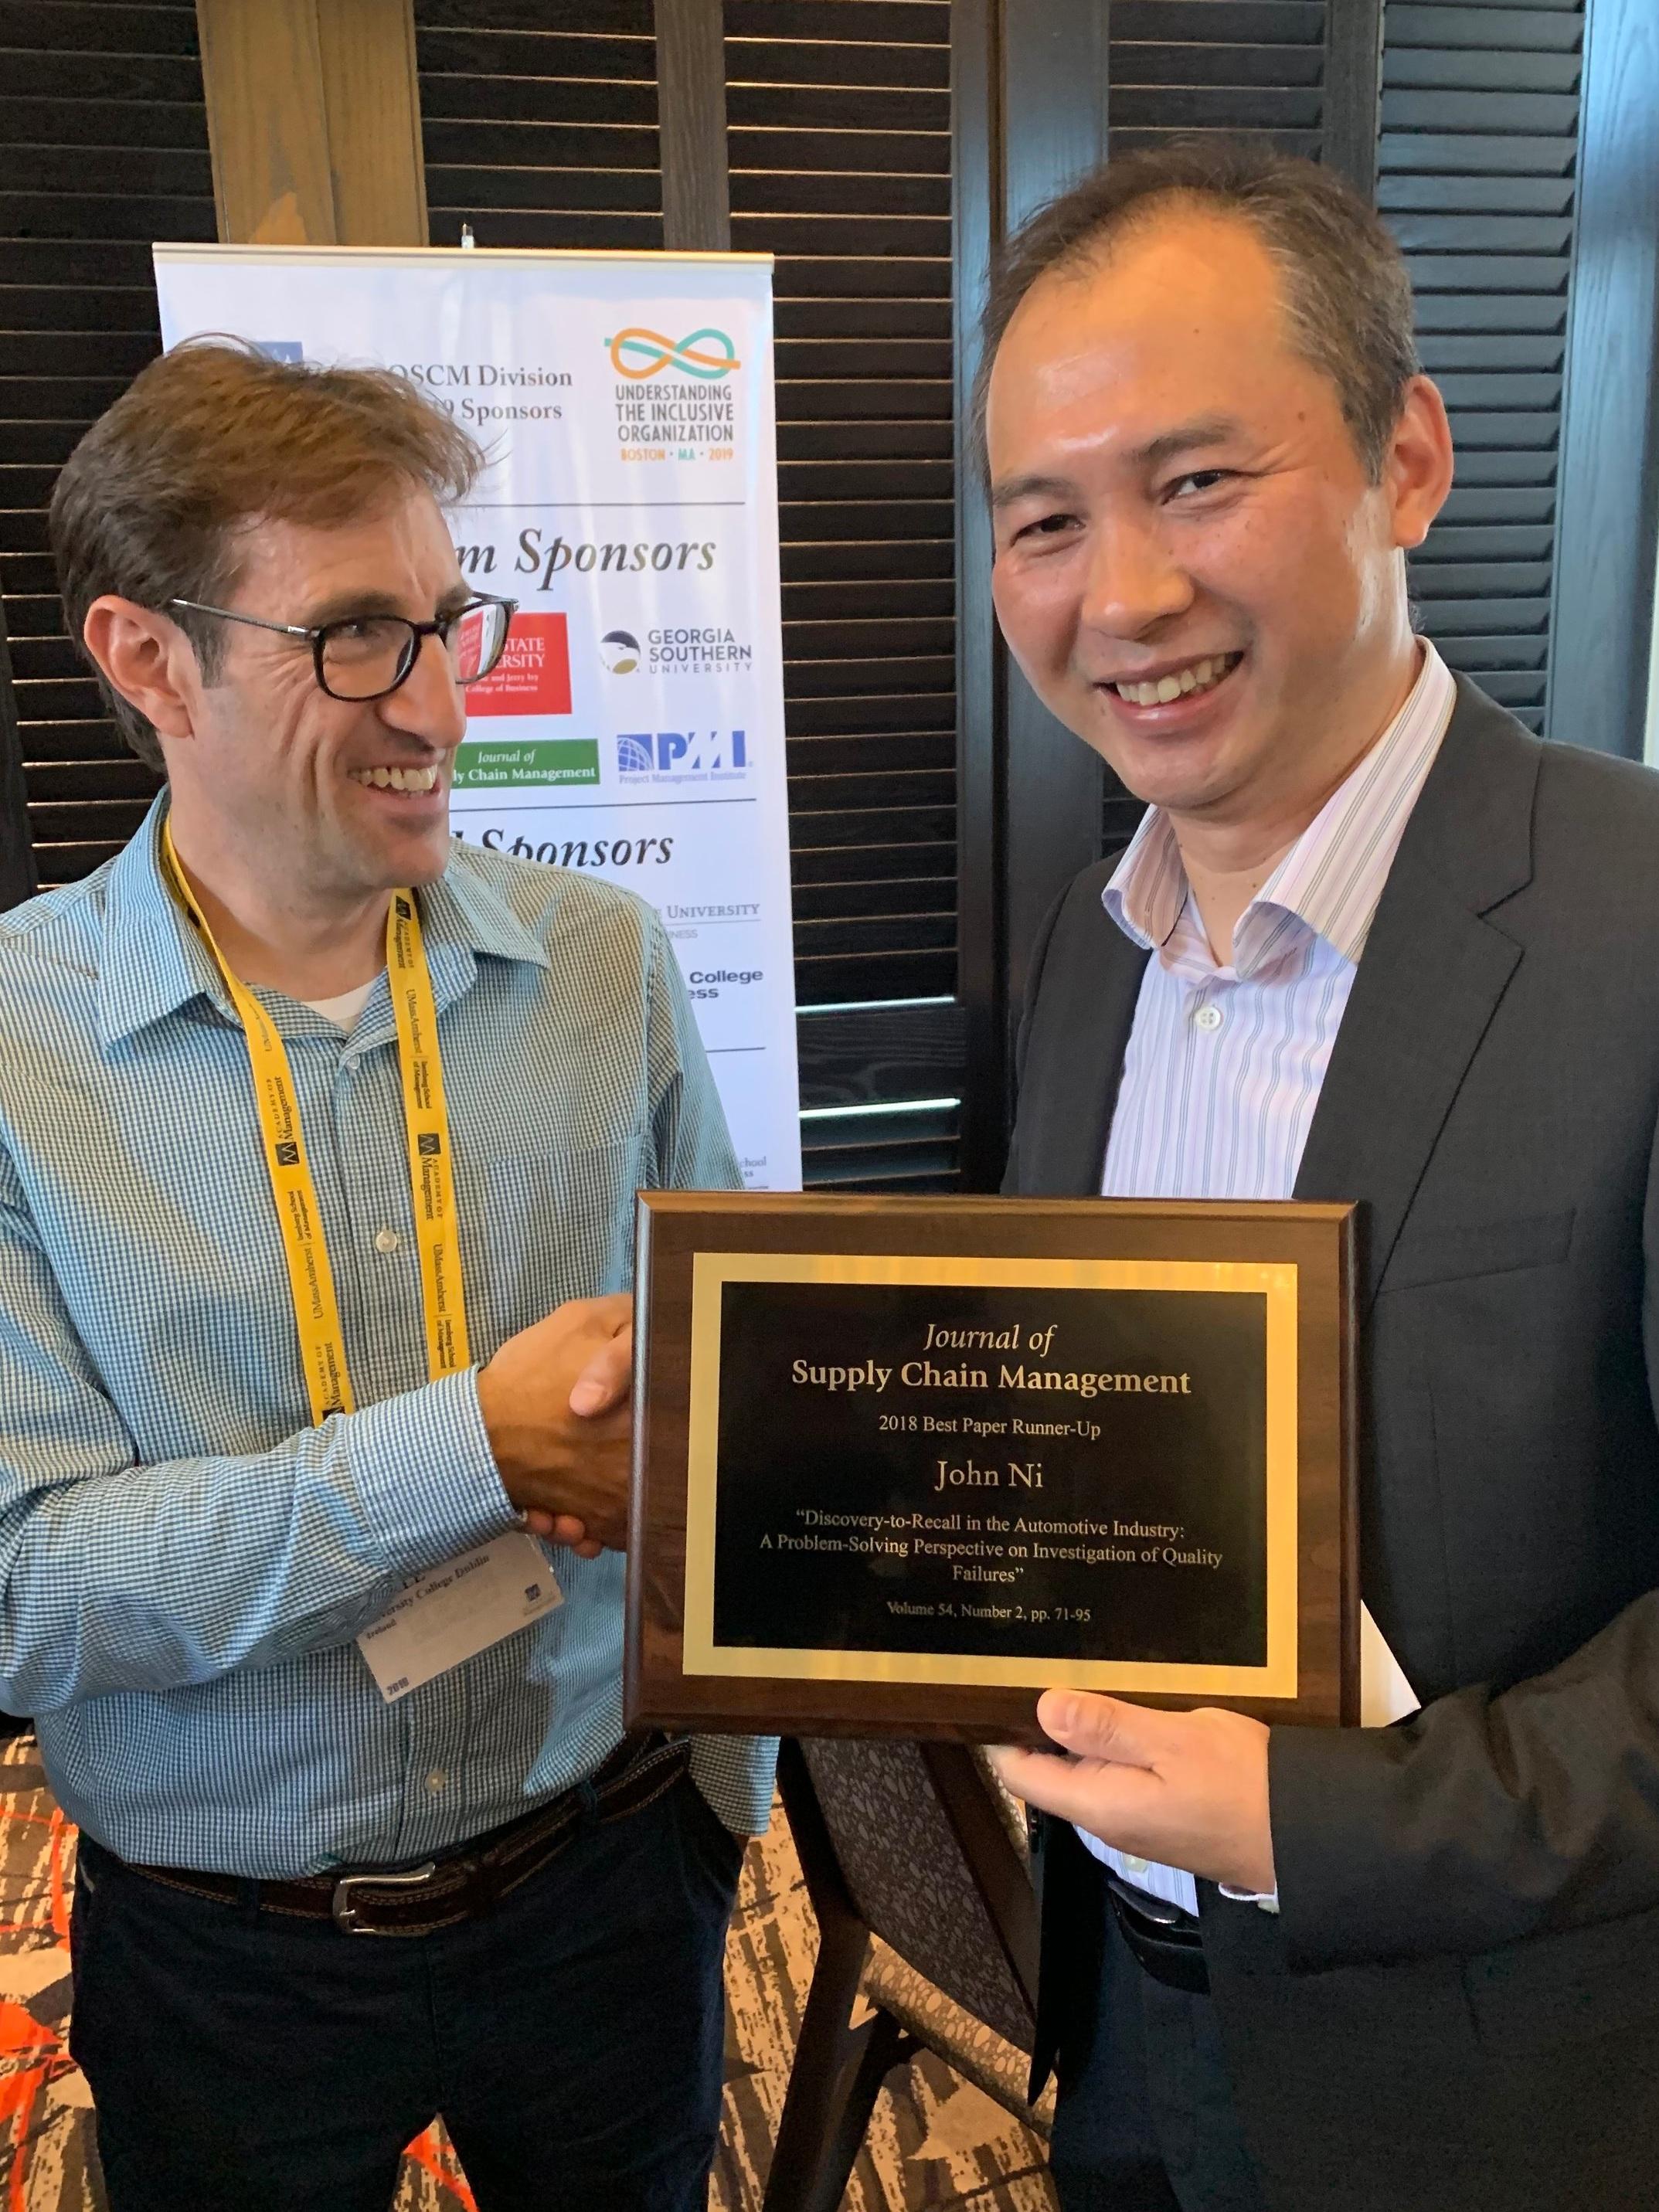 John Ni accepting his honourable mention award for his paper